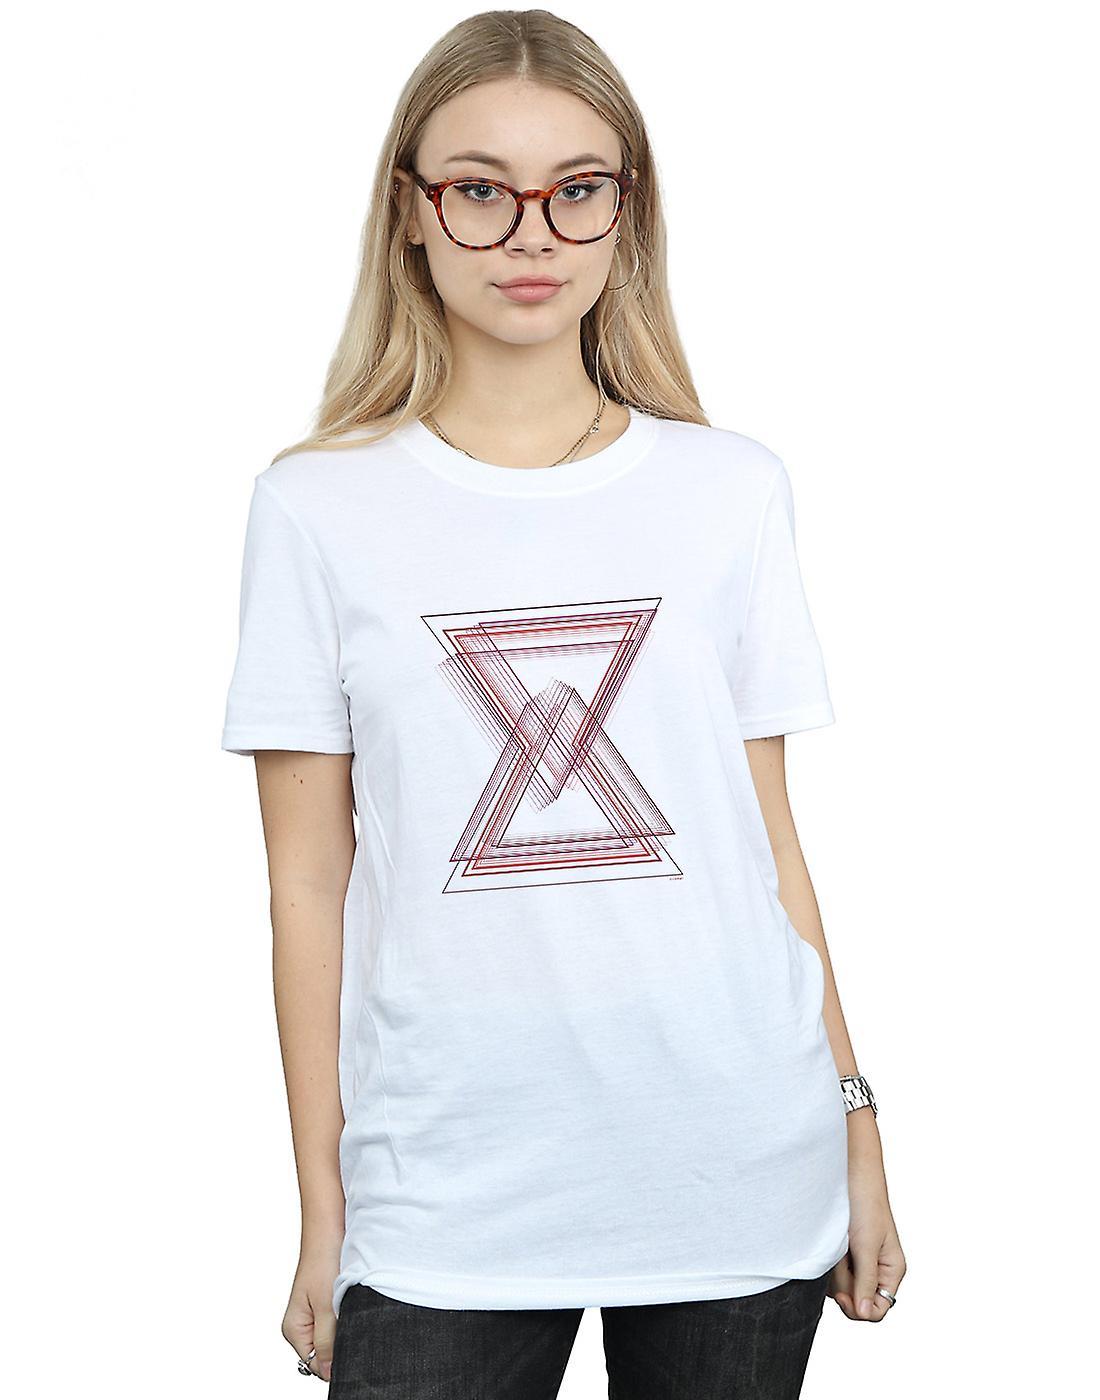 Marvel Women's Avengers Infinity War Black Widow Lines Boyfriend Fit T-Shirt